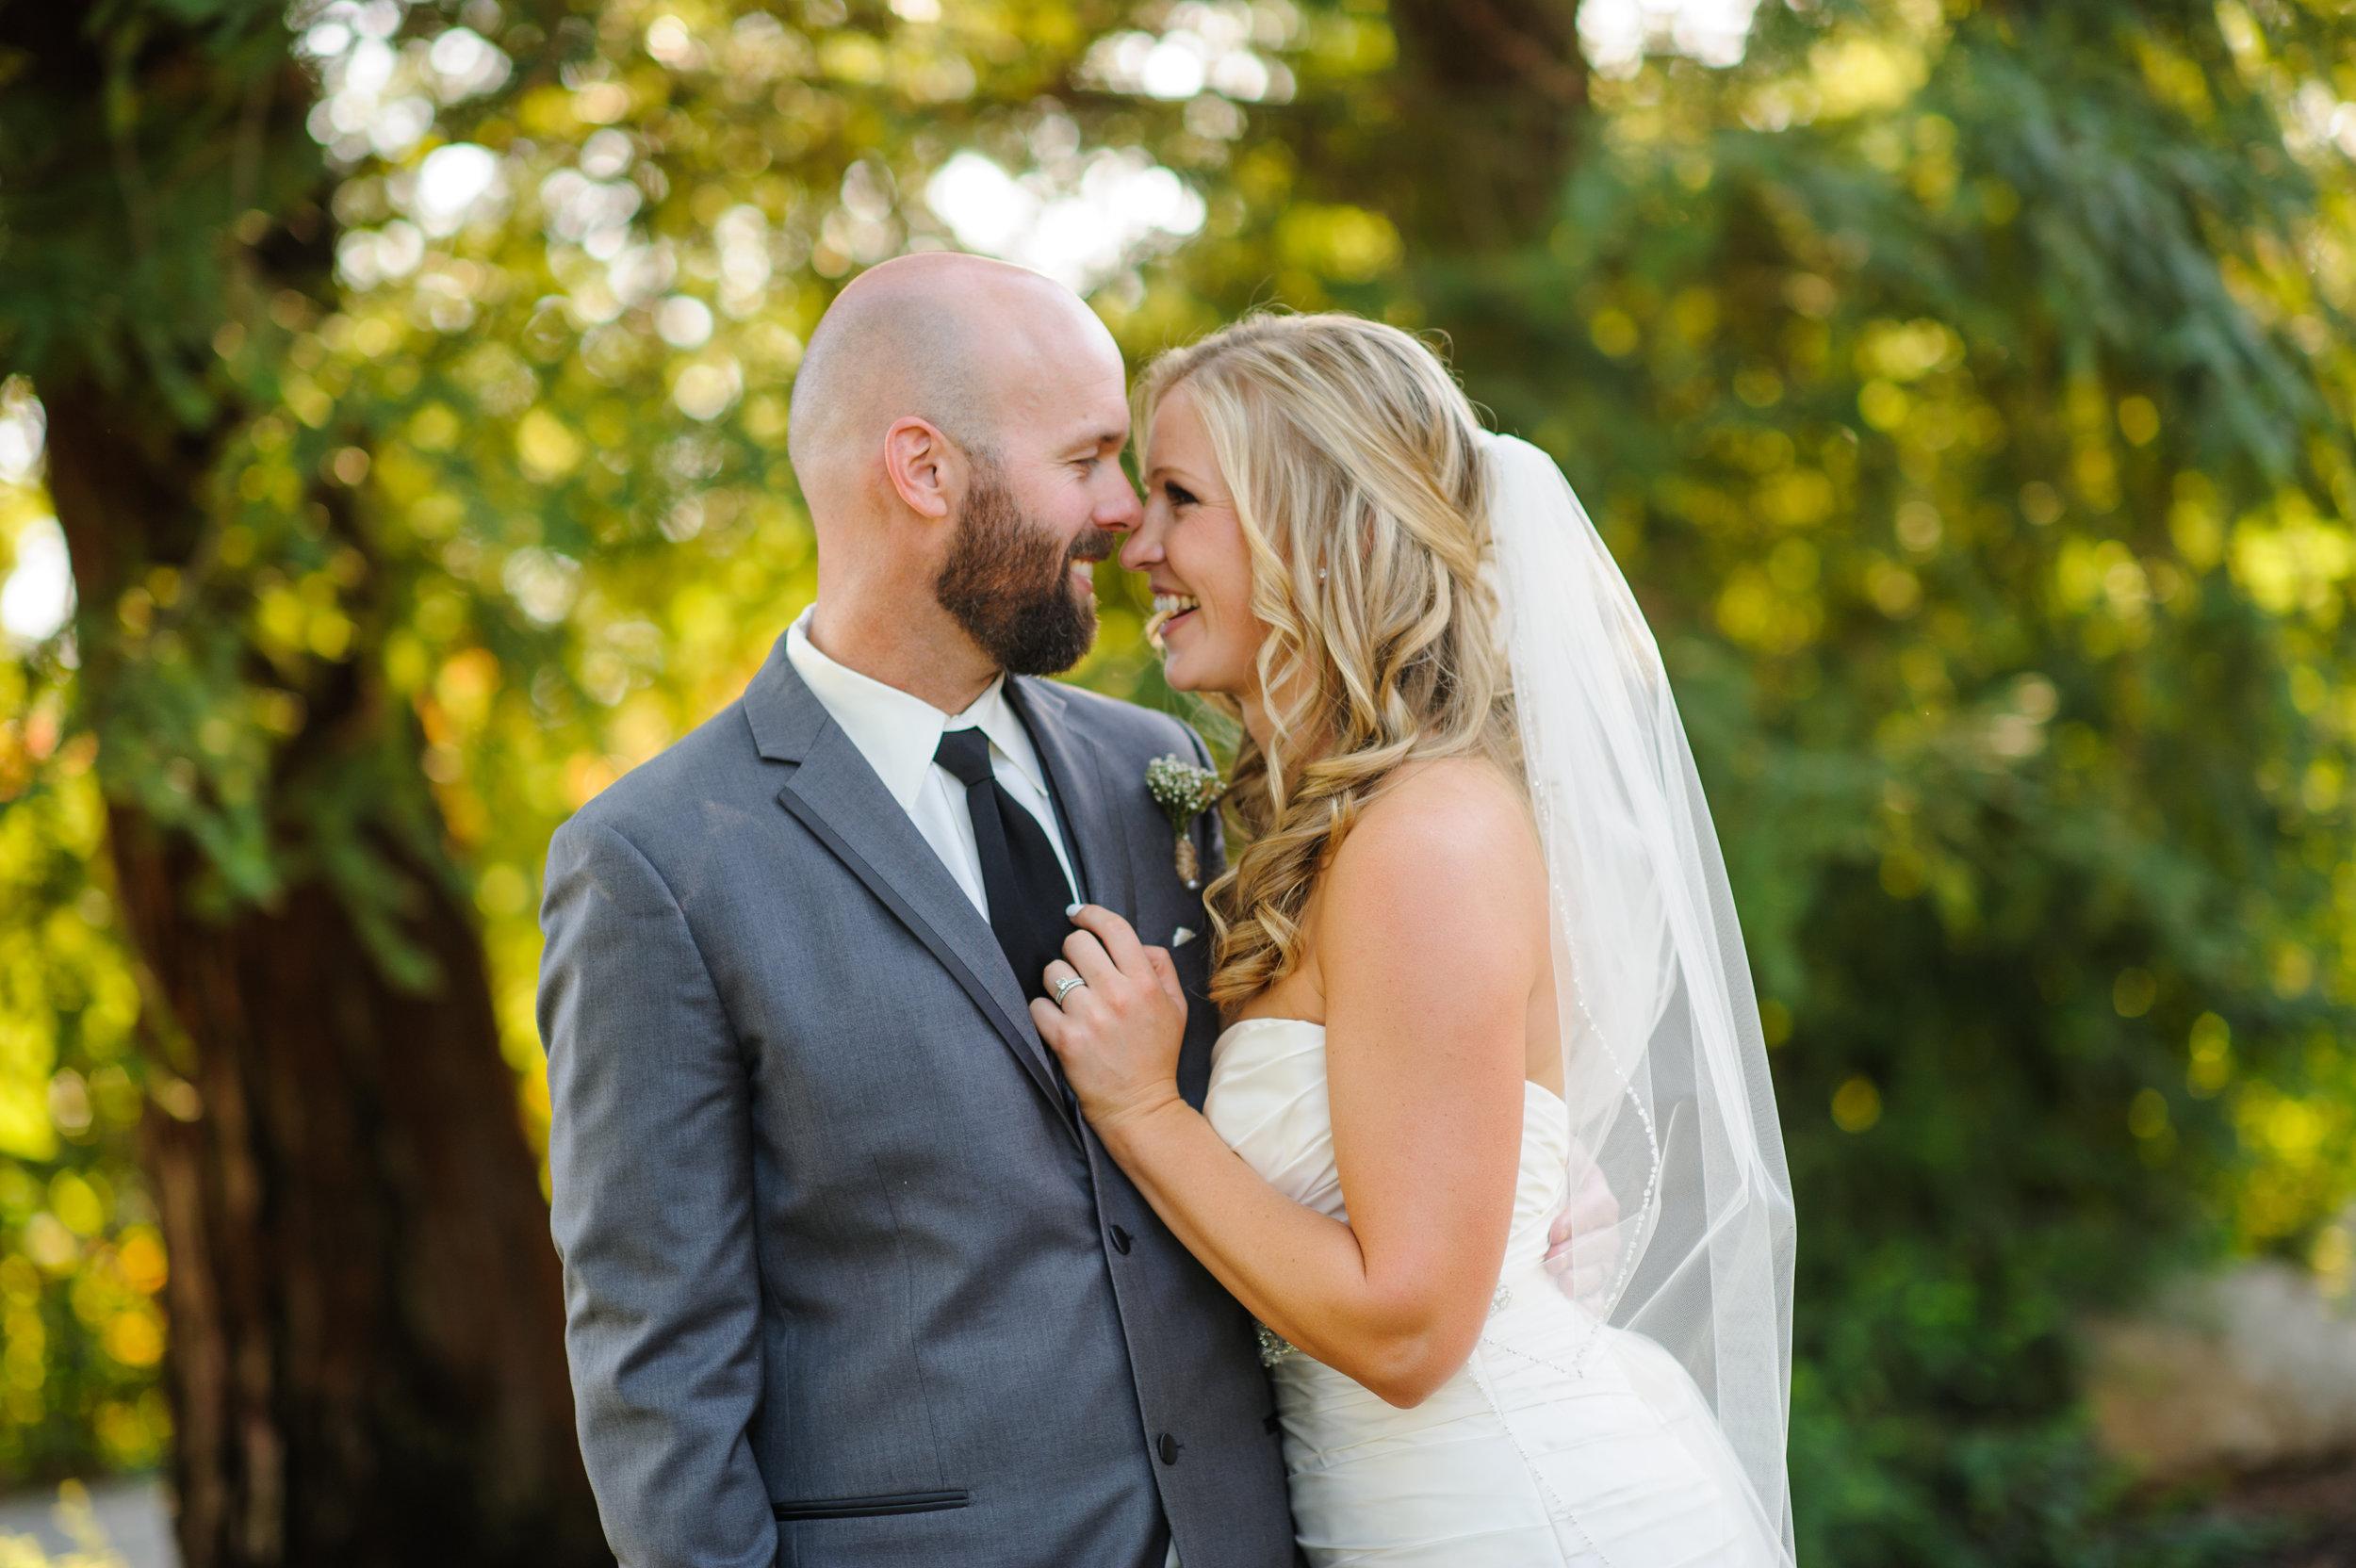 lindsey-alex-023-backyard-sacramento-wedding-photographer-katherine-nicole-photography.JPG